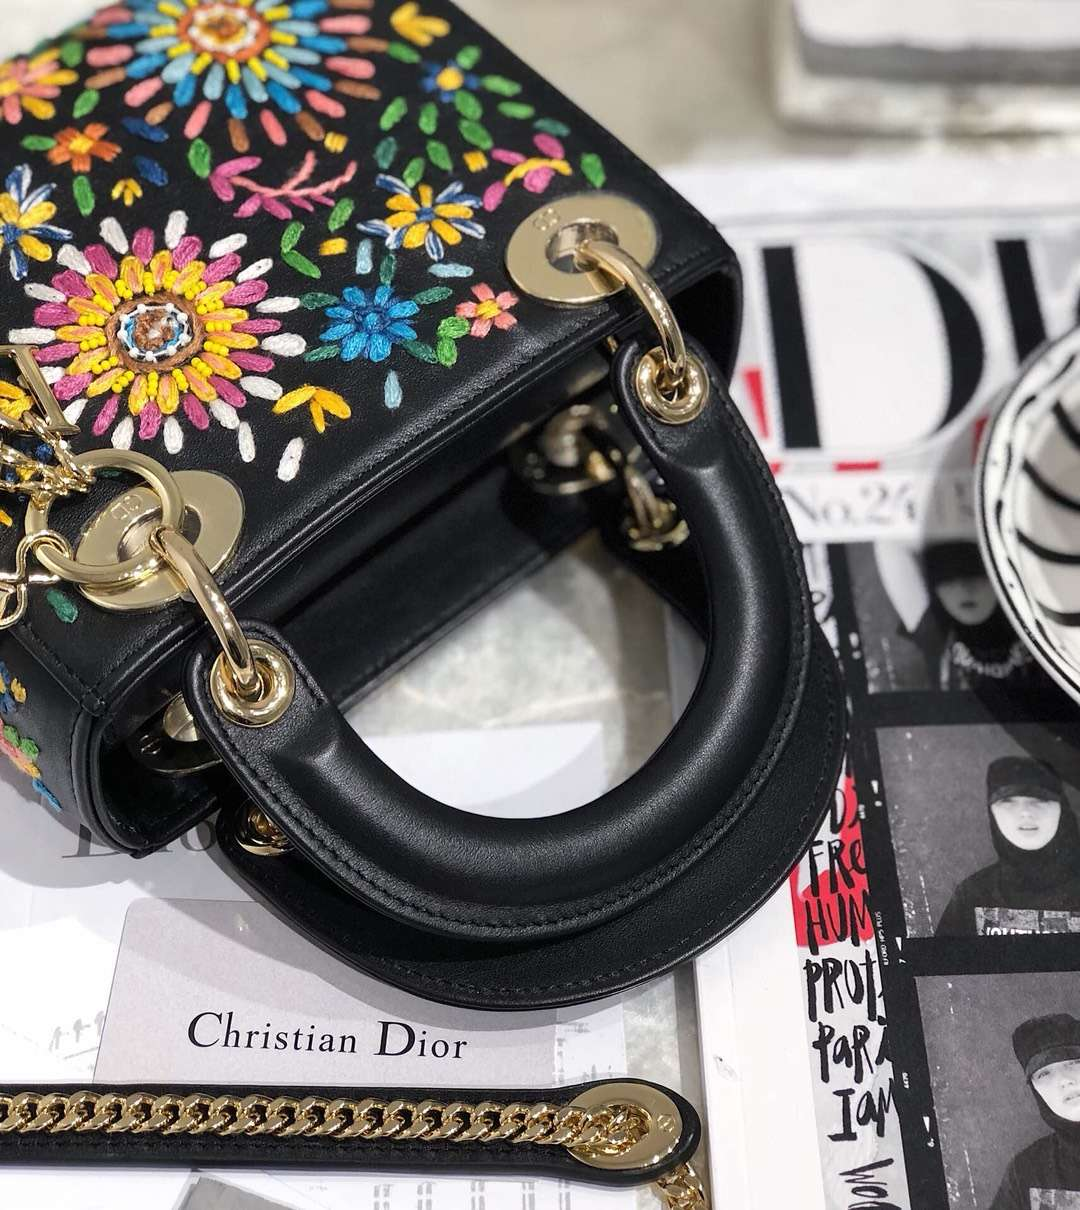 Dior2019早春限量版女包 迪奥七色堇刺绣黑色牛皮迷你戴妃包Lady Dior mini17CM